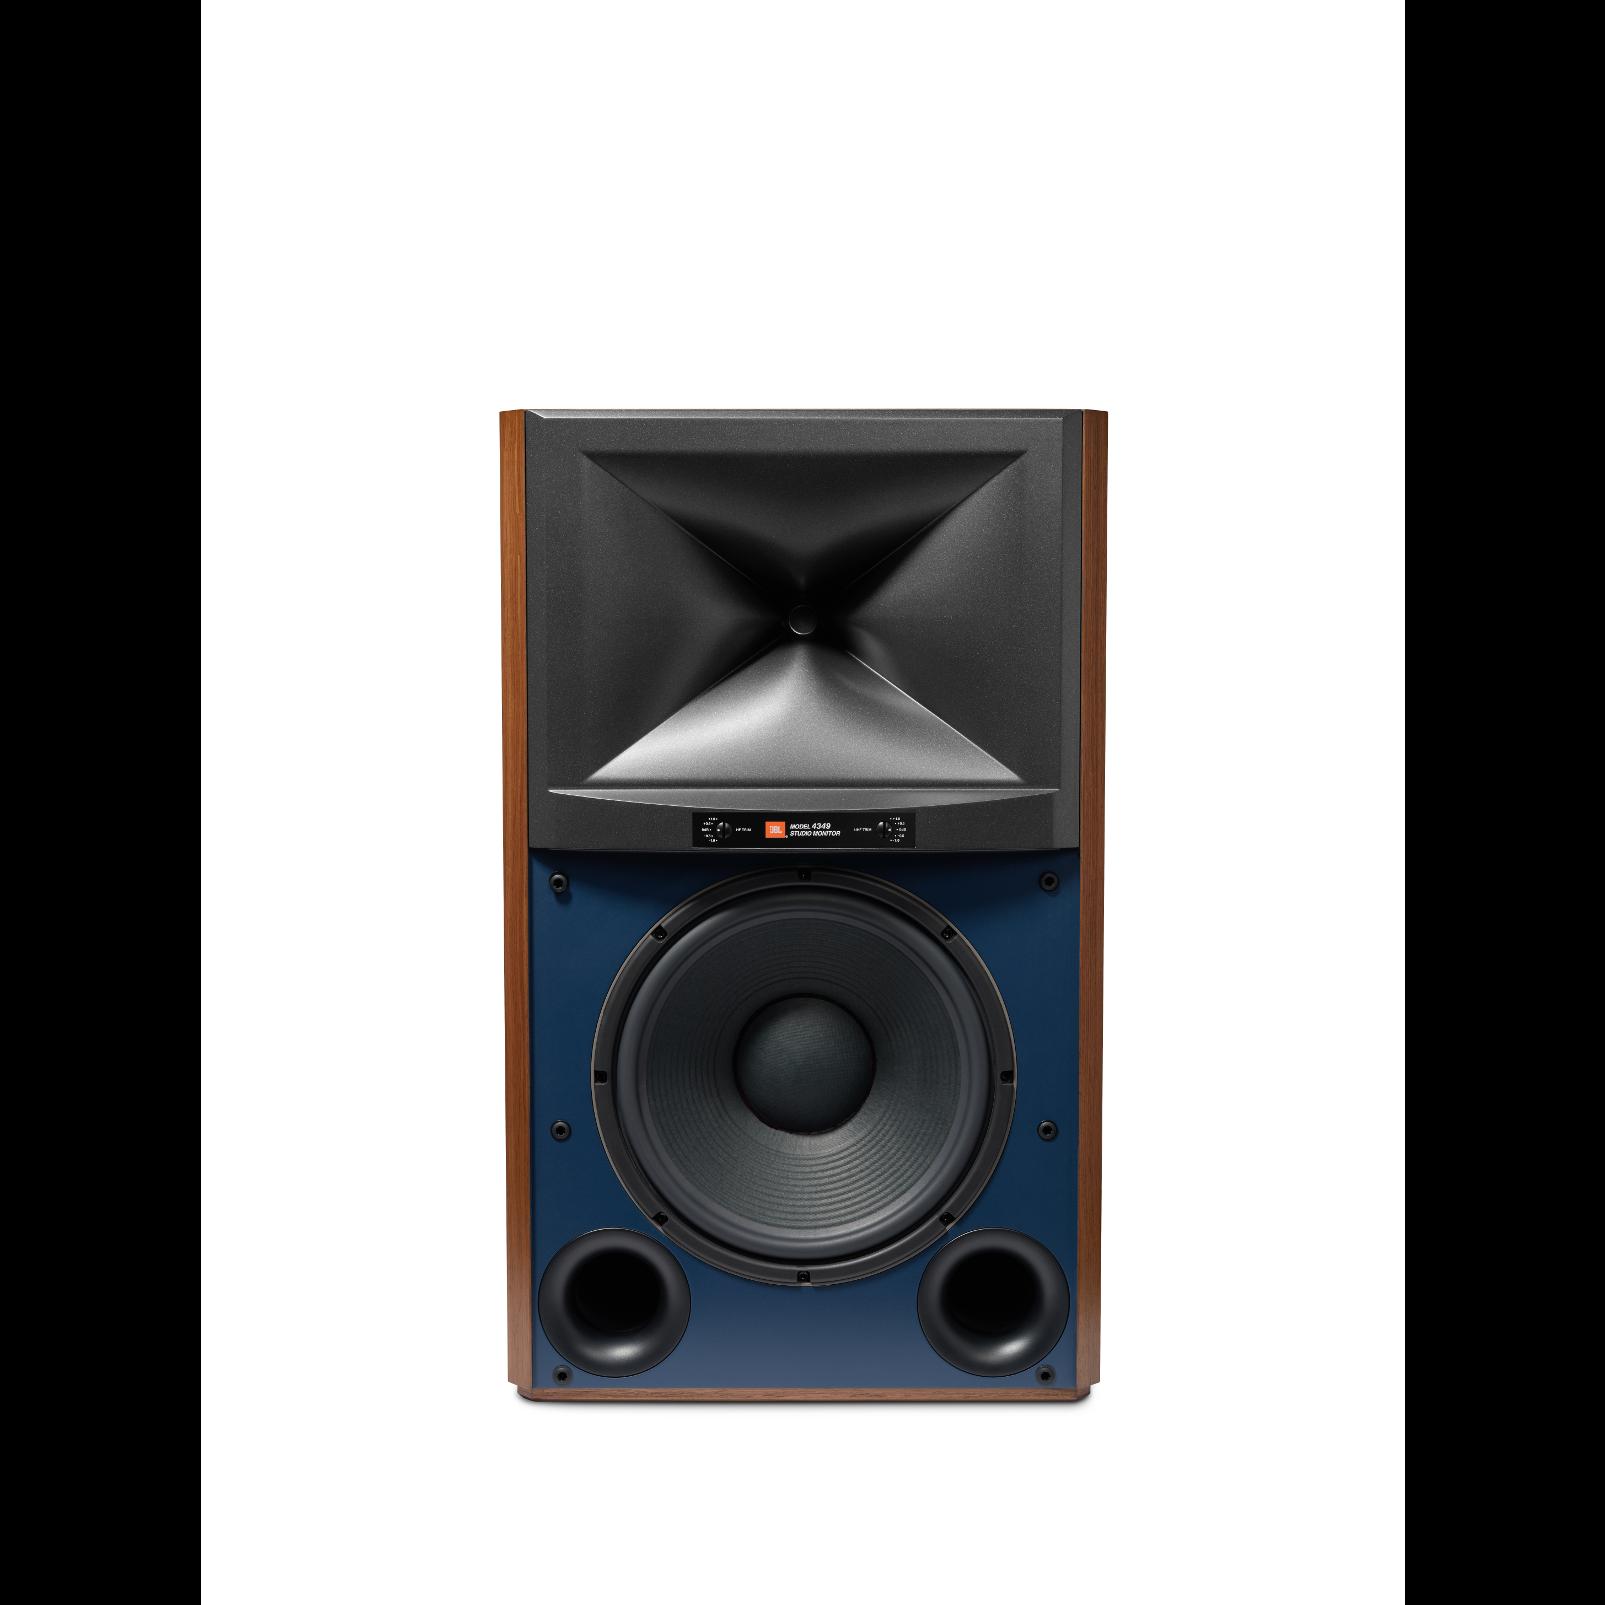 4349 - Walnut - 12-inch (300mm) 2-way Studio Monitor Loudspeaker - Hero